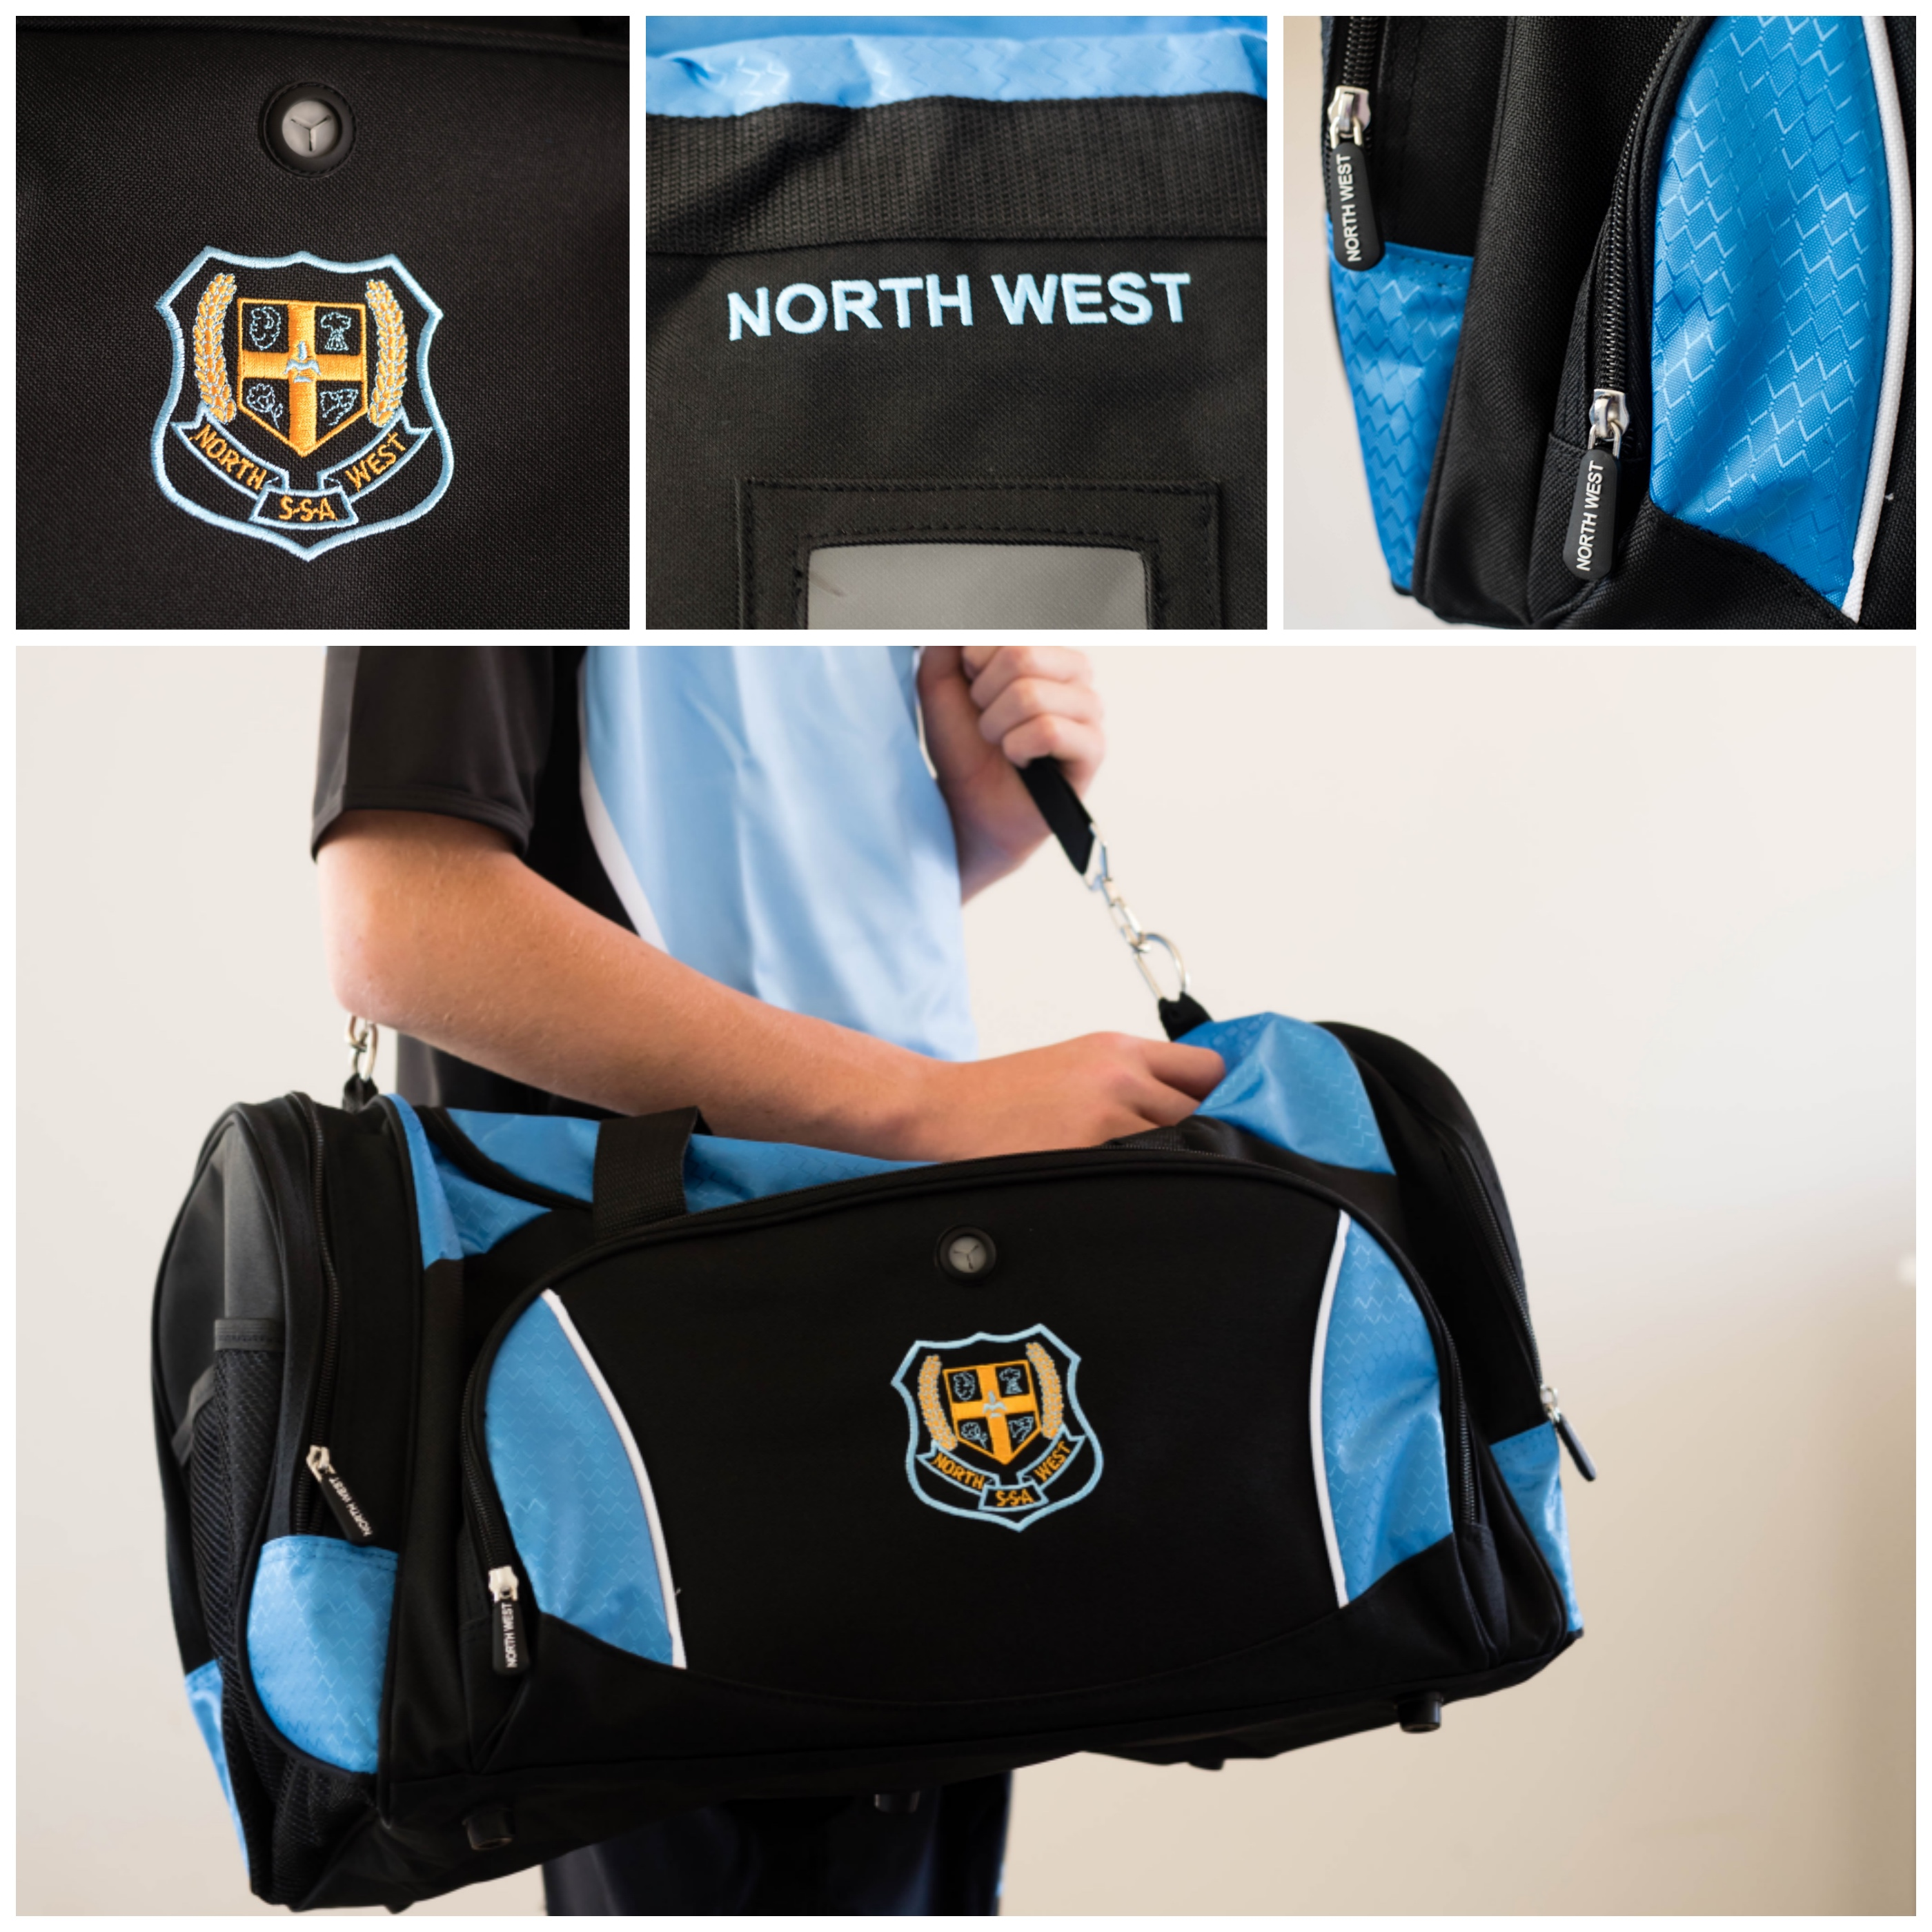 NW Sports bag